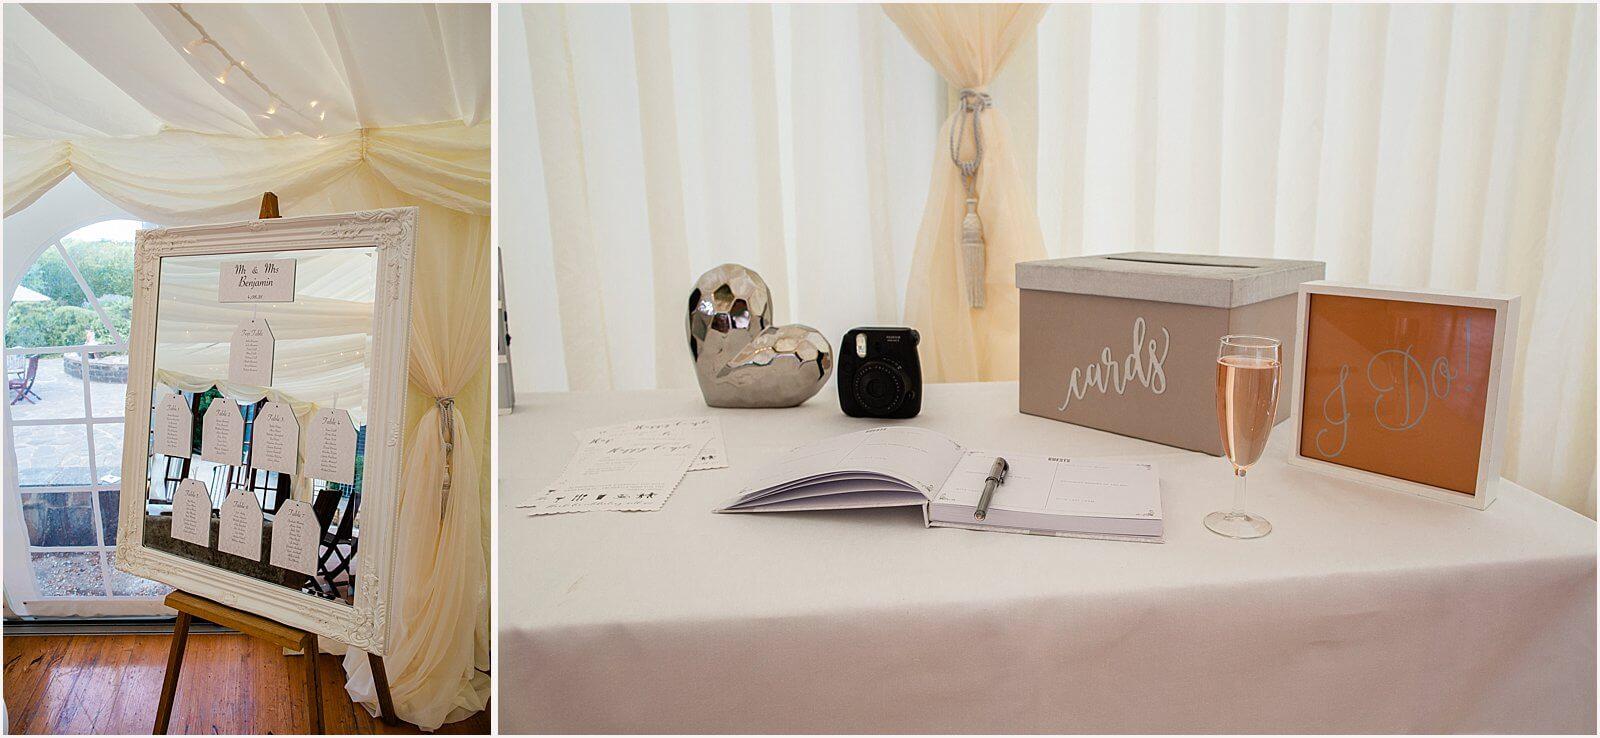 Swallows Oast Wedding - Jakki + Luke's barn wedding photography 40